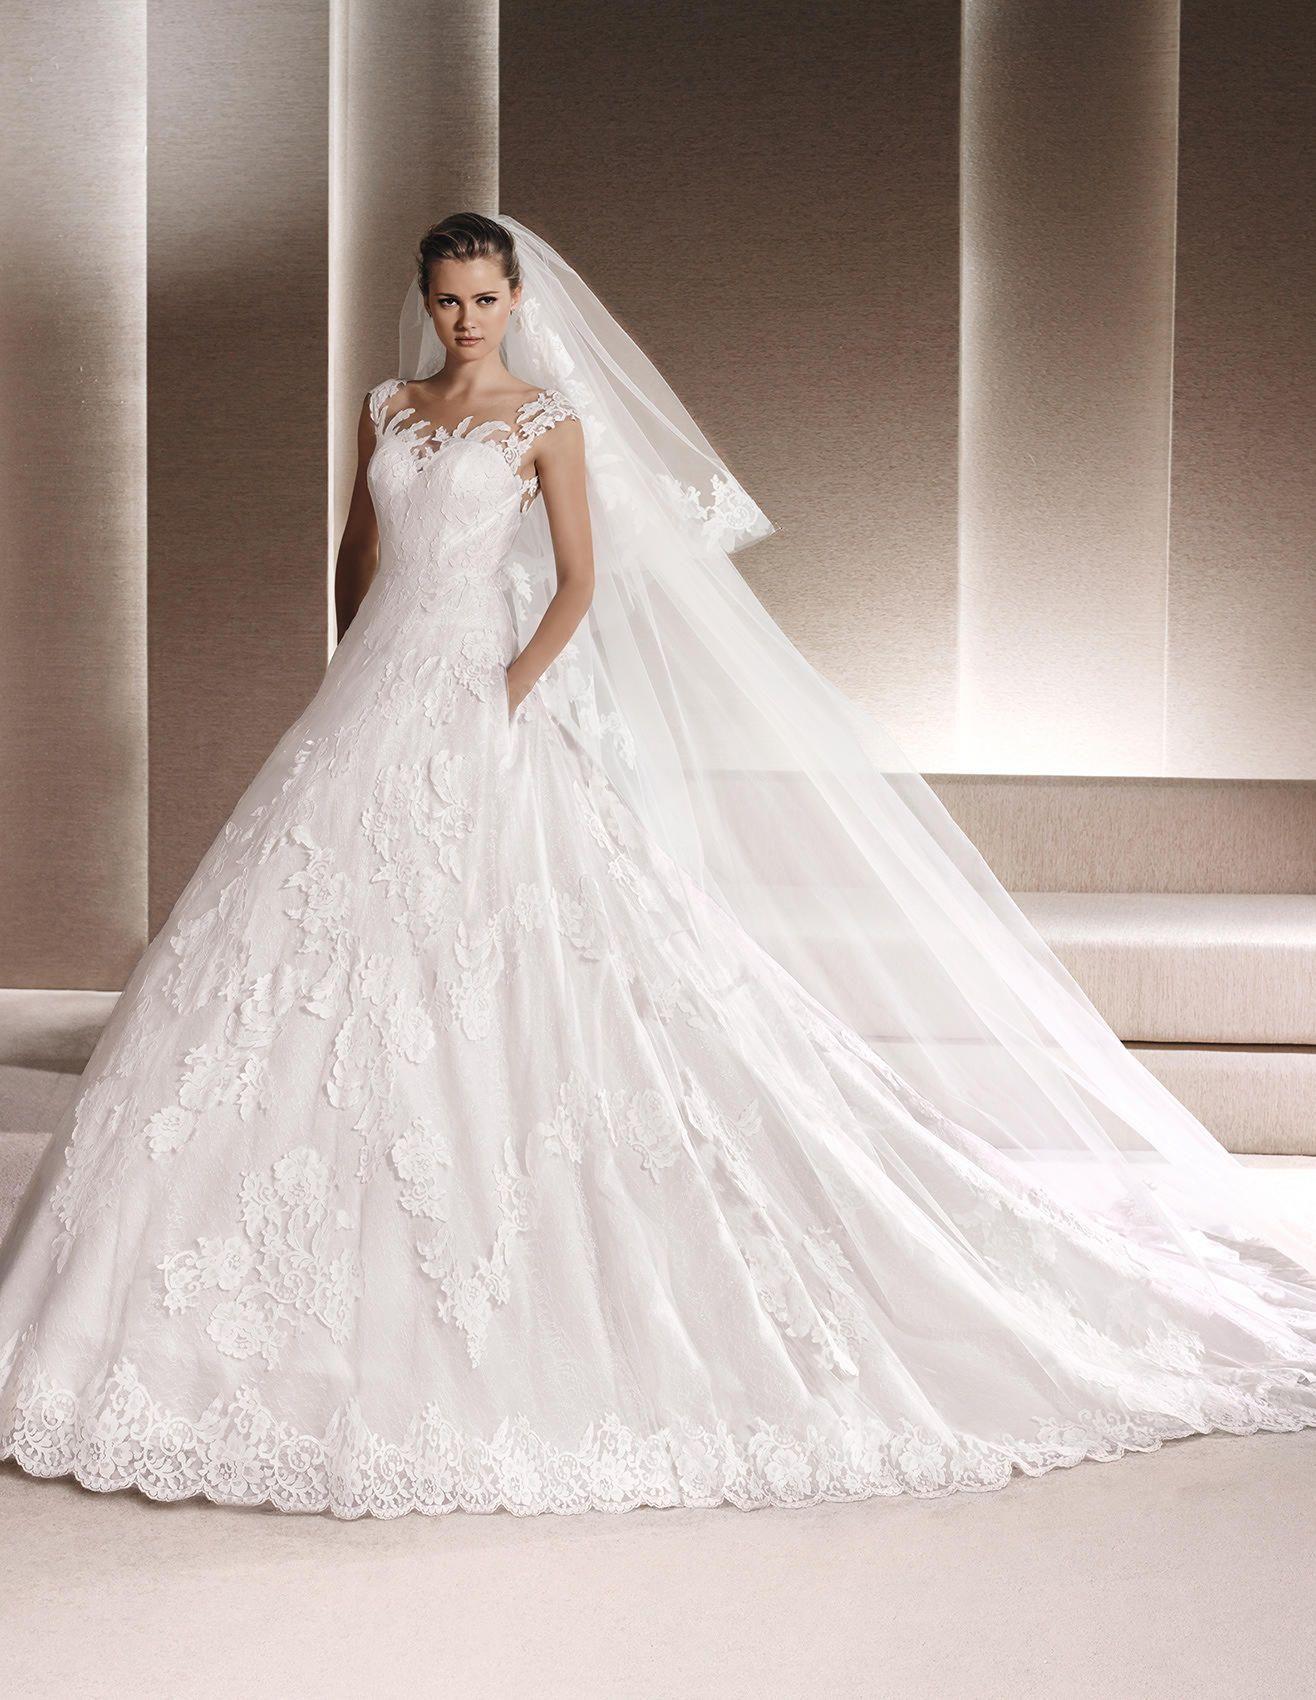 RAELLA - Original mermaid wedding dress | La Sposa